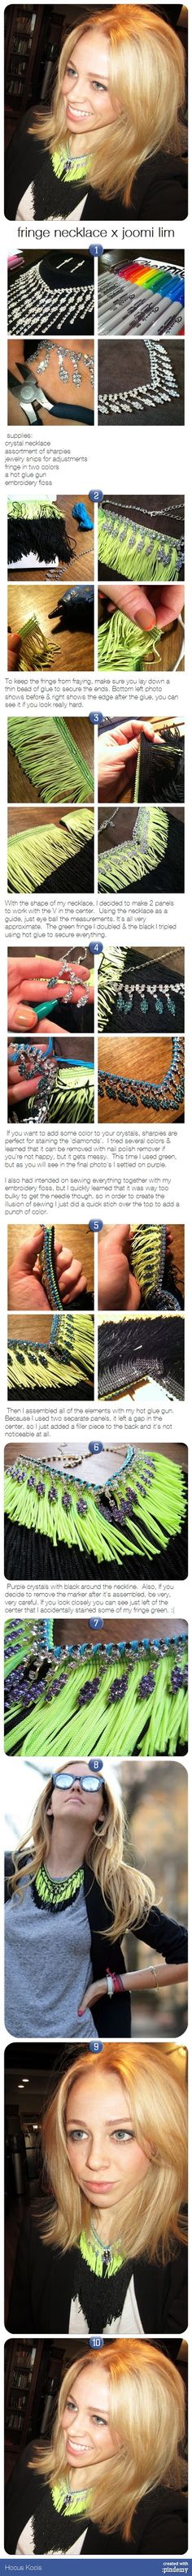 fringe necklace x joomi lim via pindemy.com